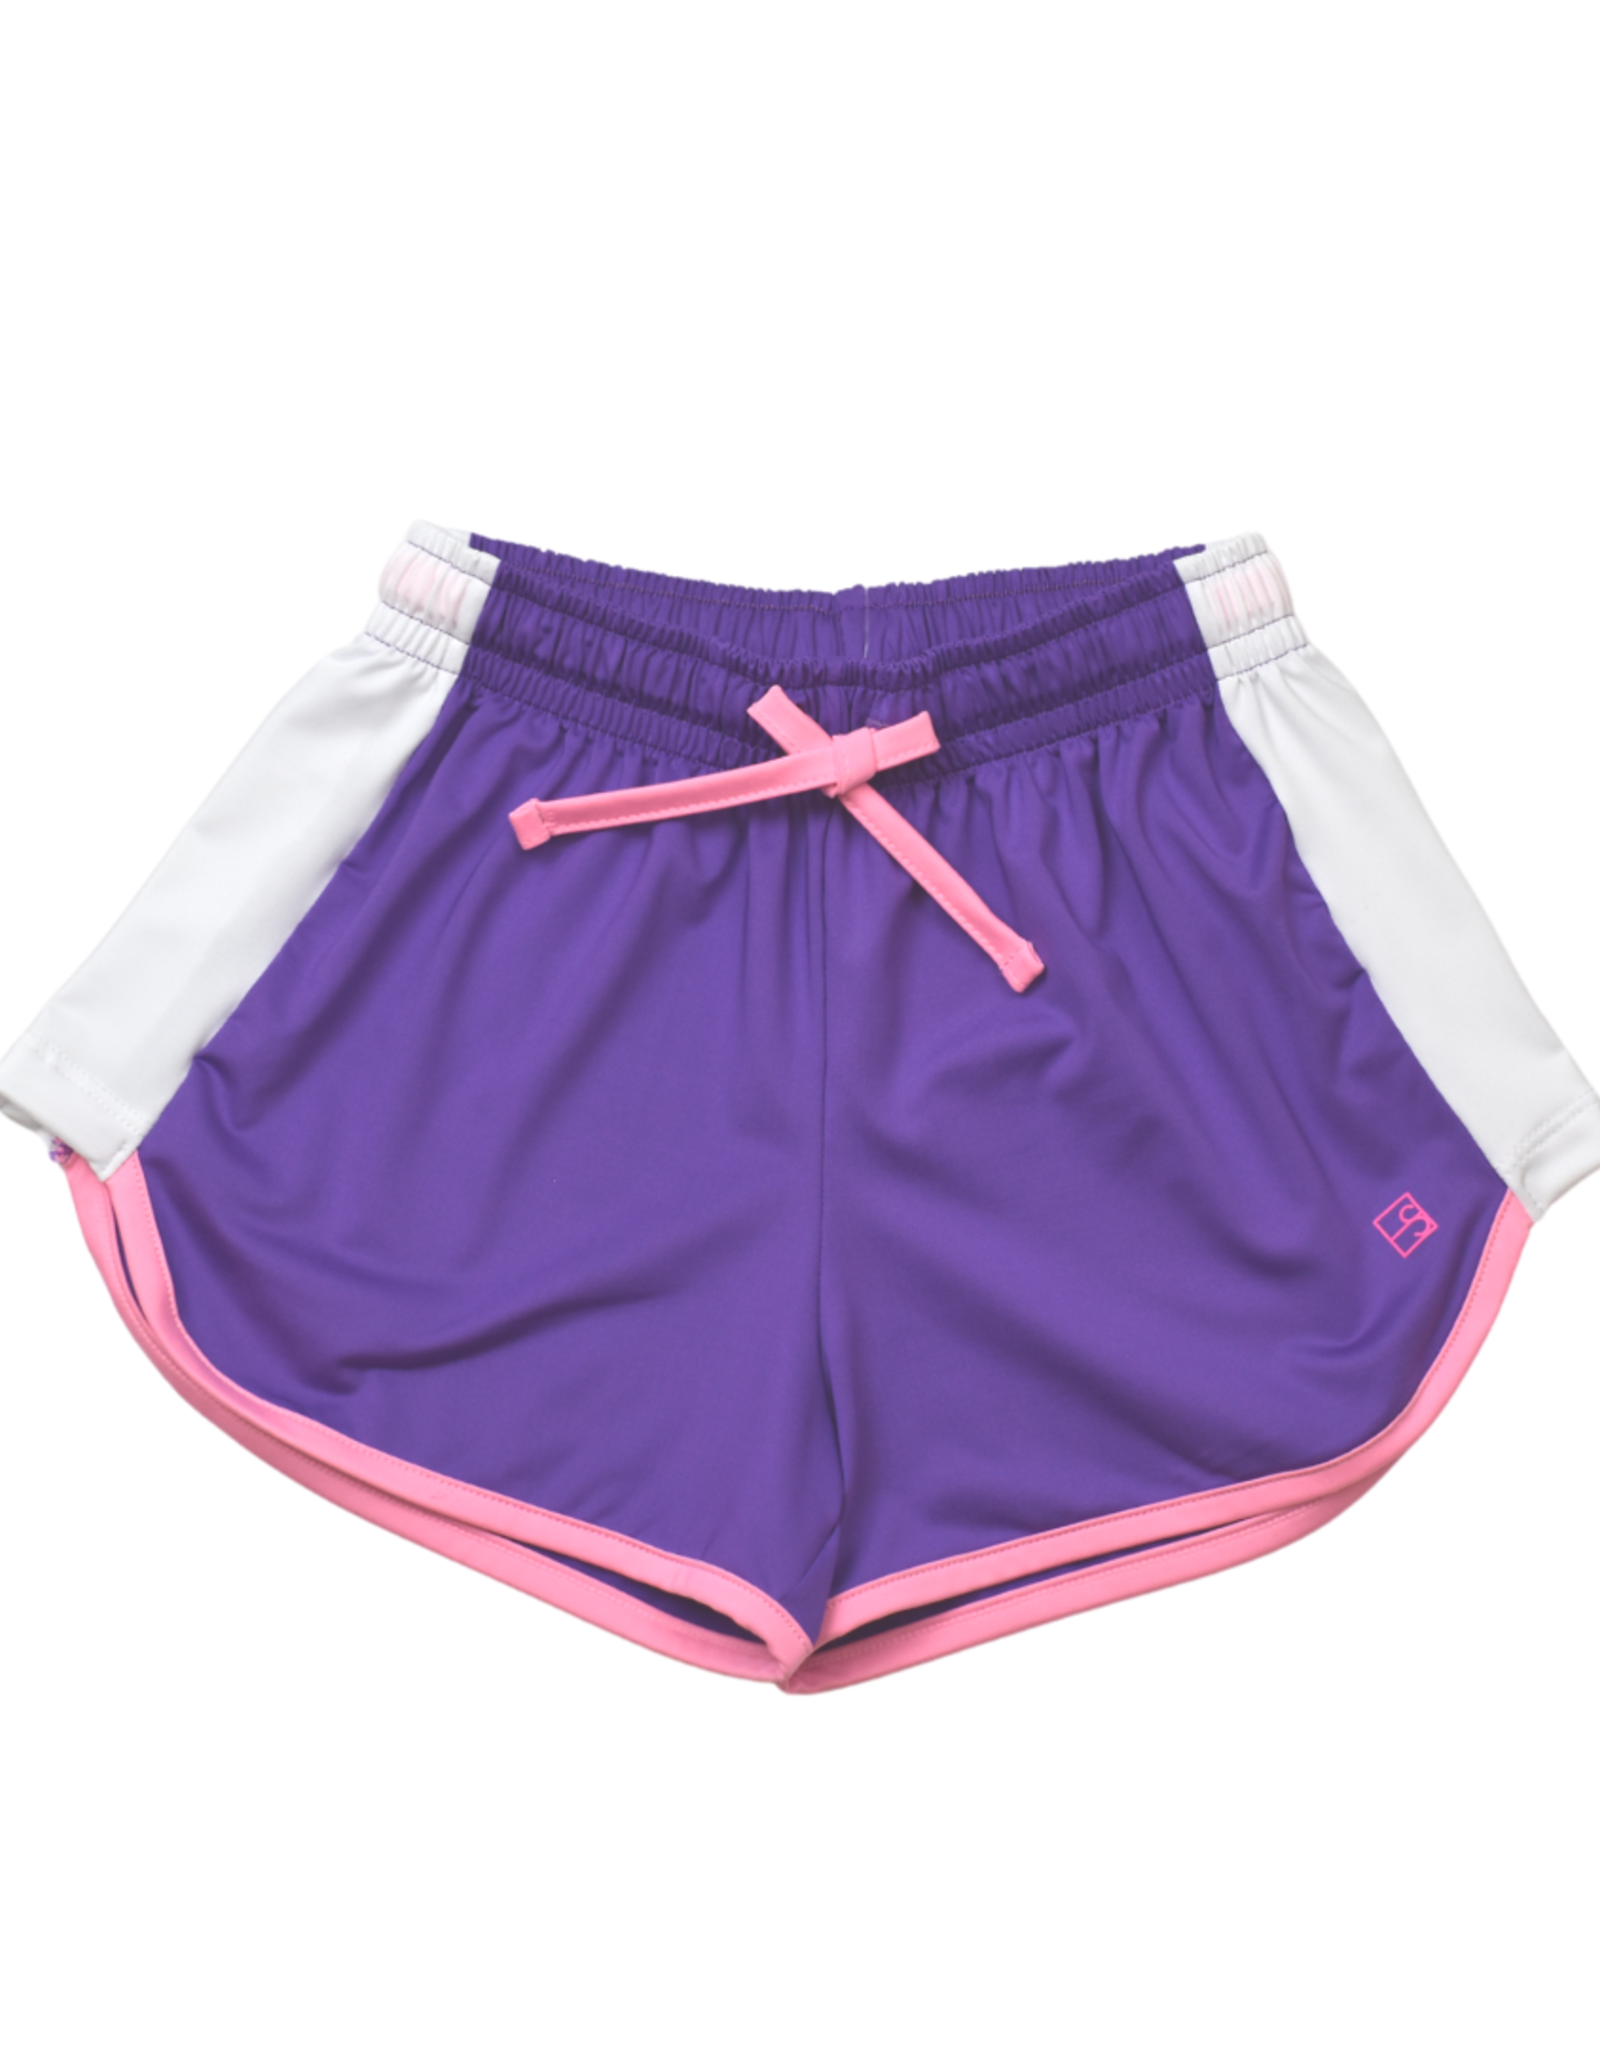 SET Annie Short - Purple with White Sides